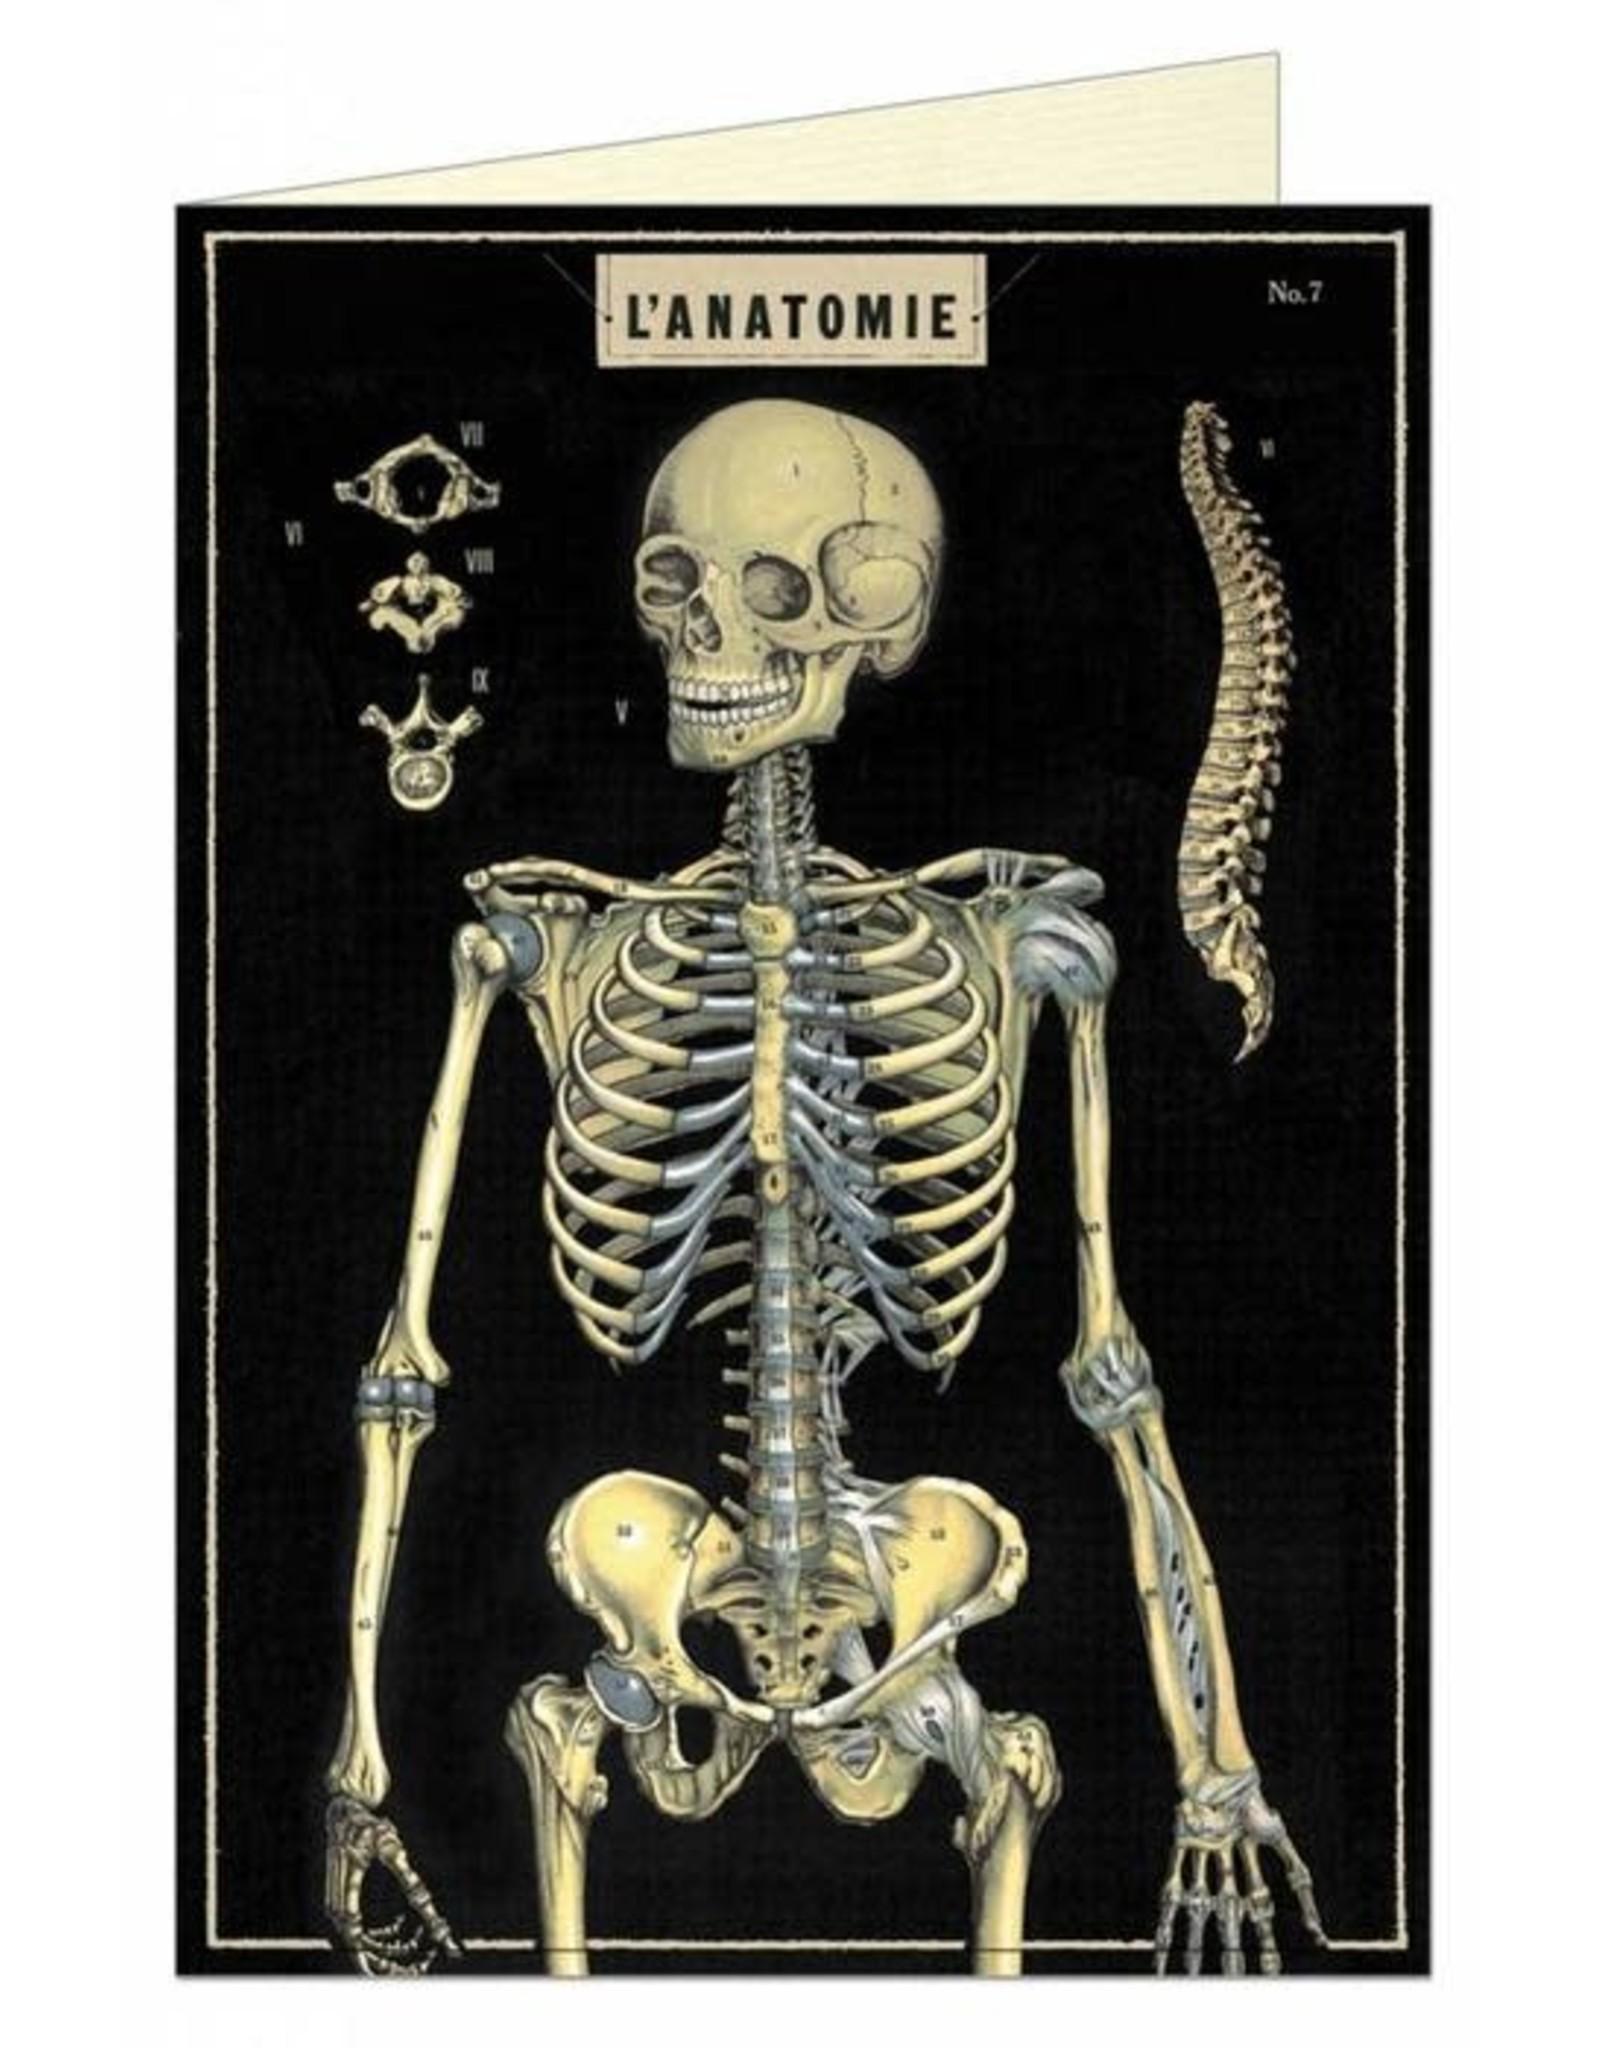 Cavallini Papers L' Anatomie Skeleton Greeting Card - Cavallini Papers